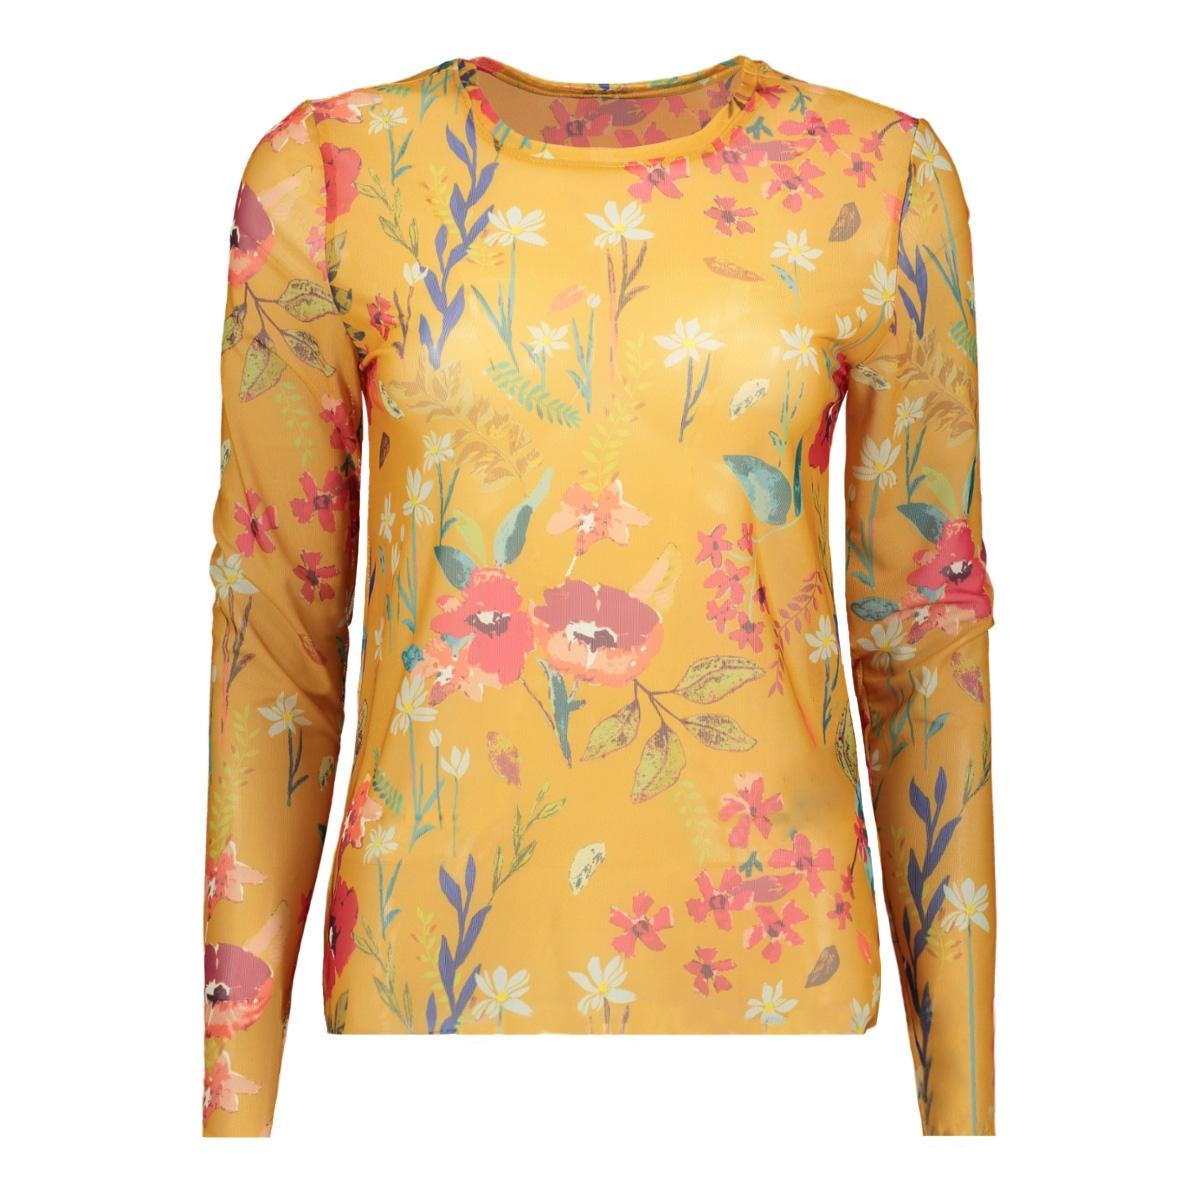 onlstine l/s o-neck top jrs 15168137 only t-shirt mango mojito/preppy flow